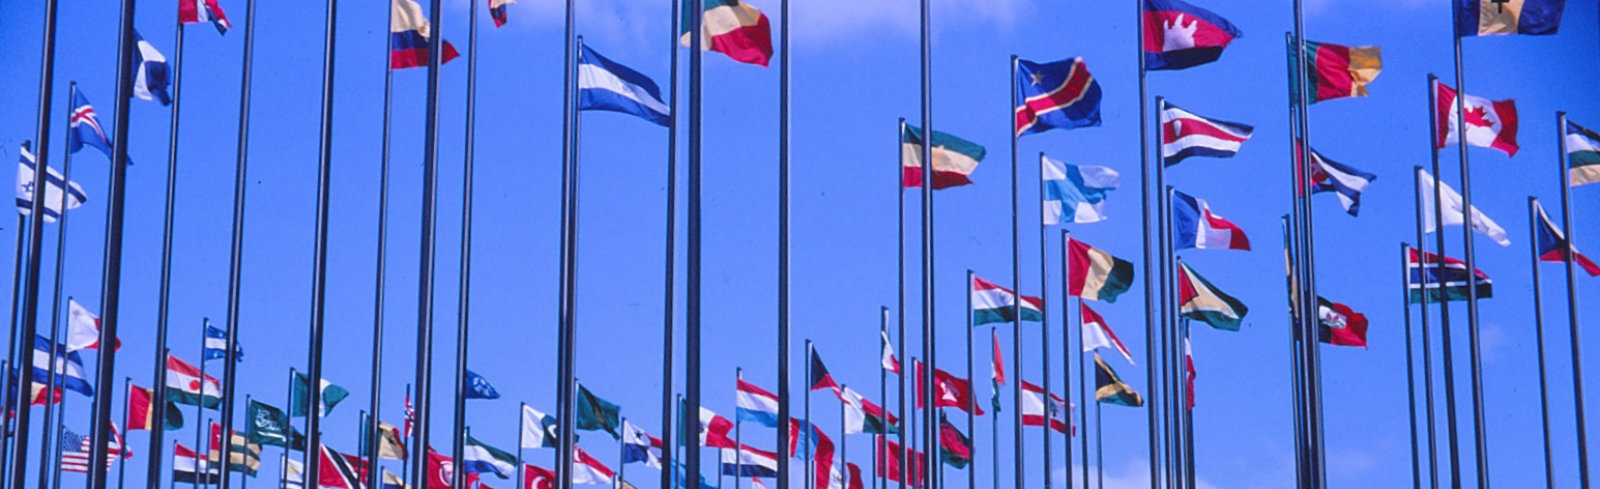 ONU tem vagas de emprego em países de língua portuguesa